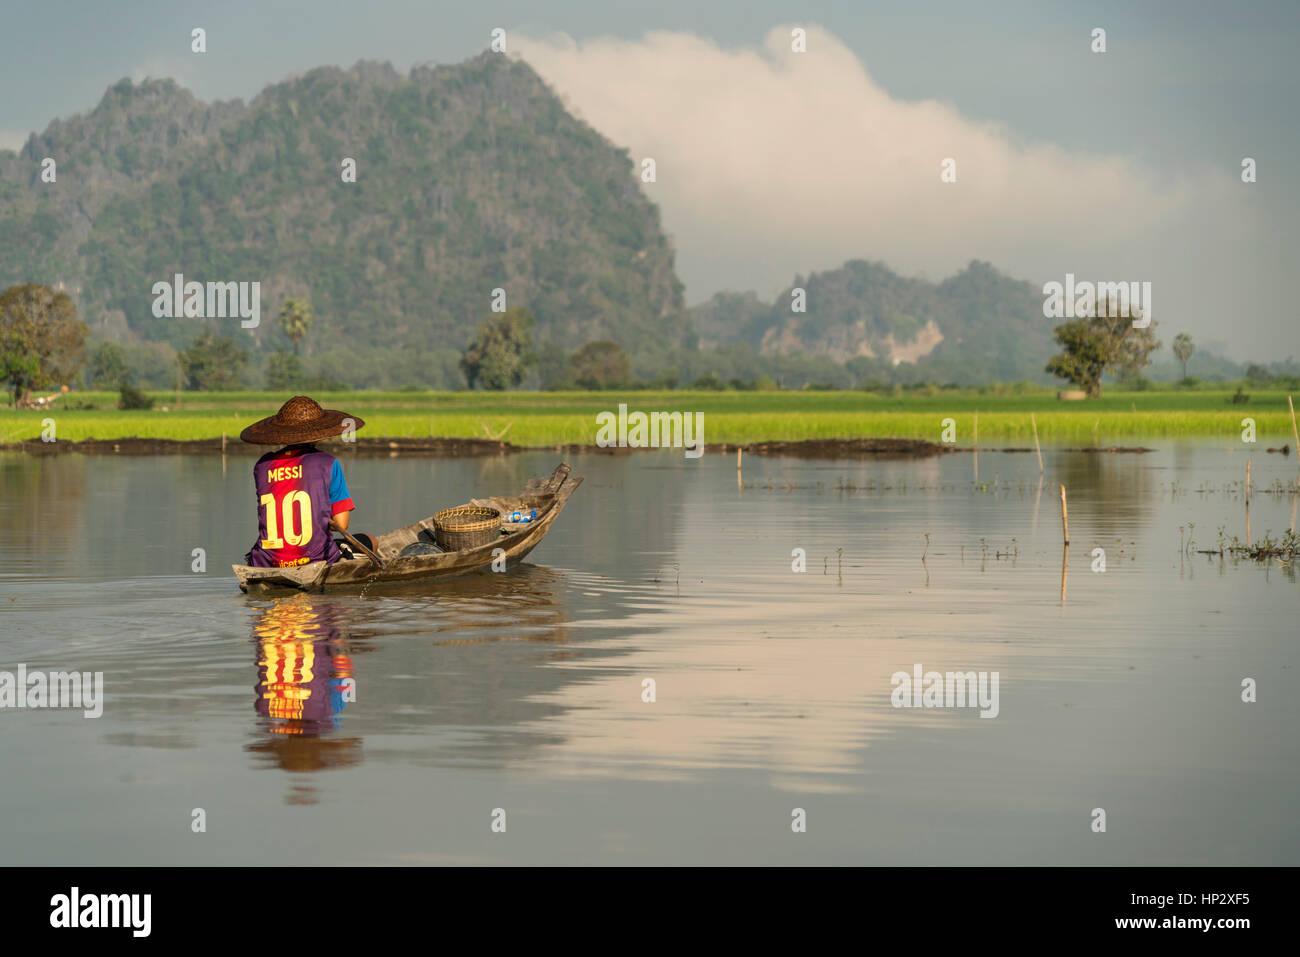 Fischer mit Boot on der Karstlandschaft bei Hpa-an, Myanmar, Asien  |  fisherman and his boat crossing the karst - Stock Image